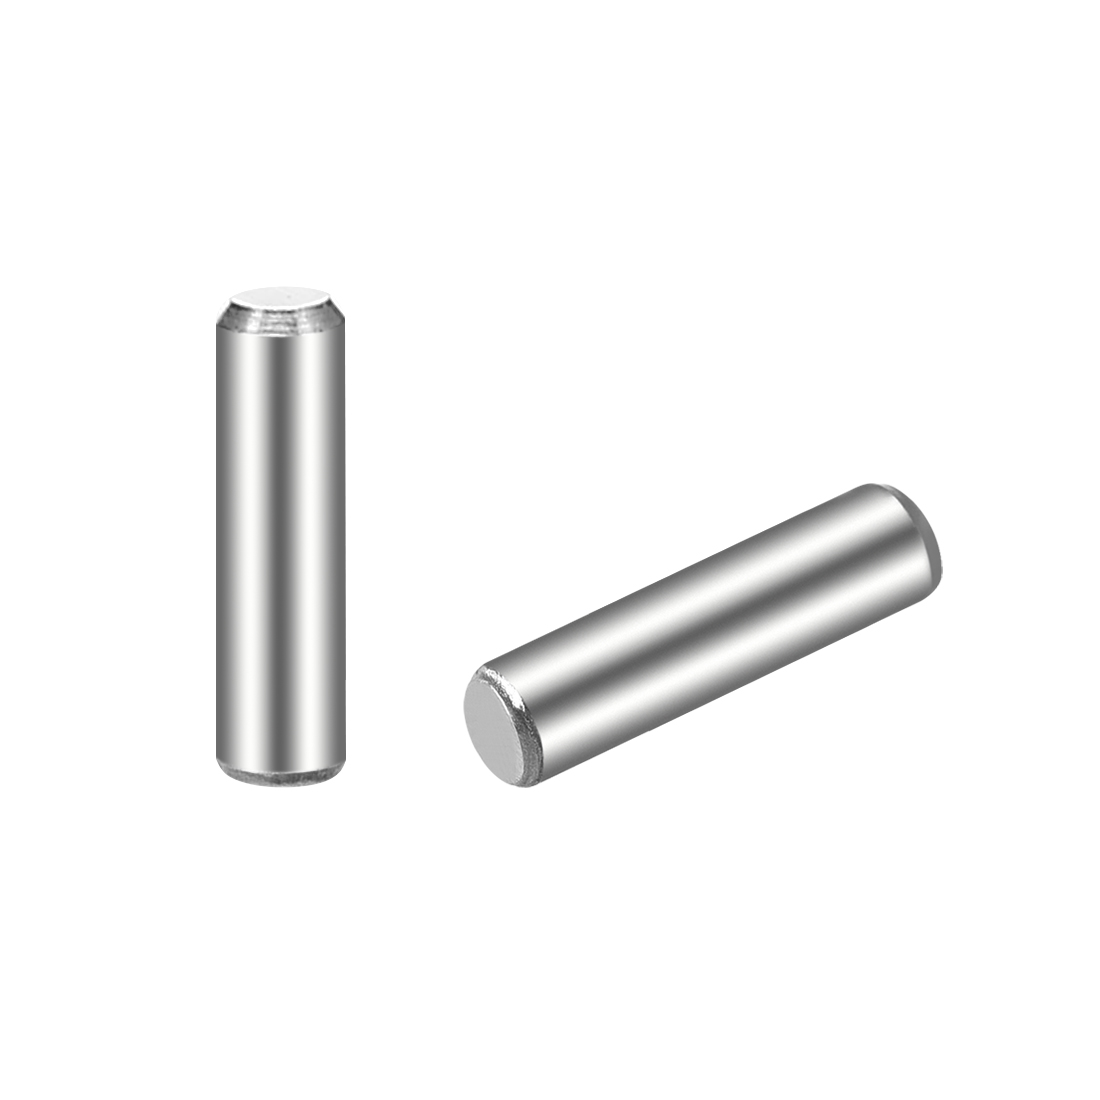 50Pcs 3mm x 12mm Dowel Pin 304 Stainless Steel Shelf Support Pin Fasten